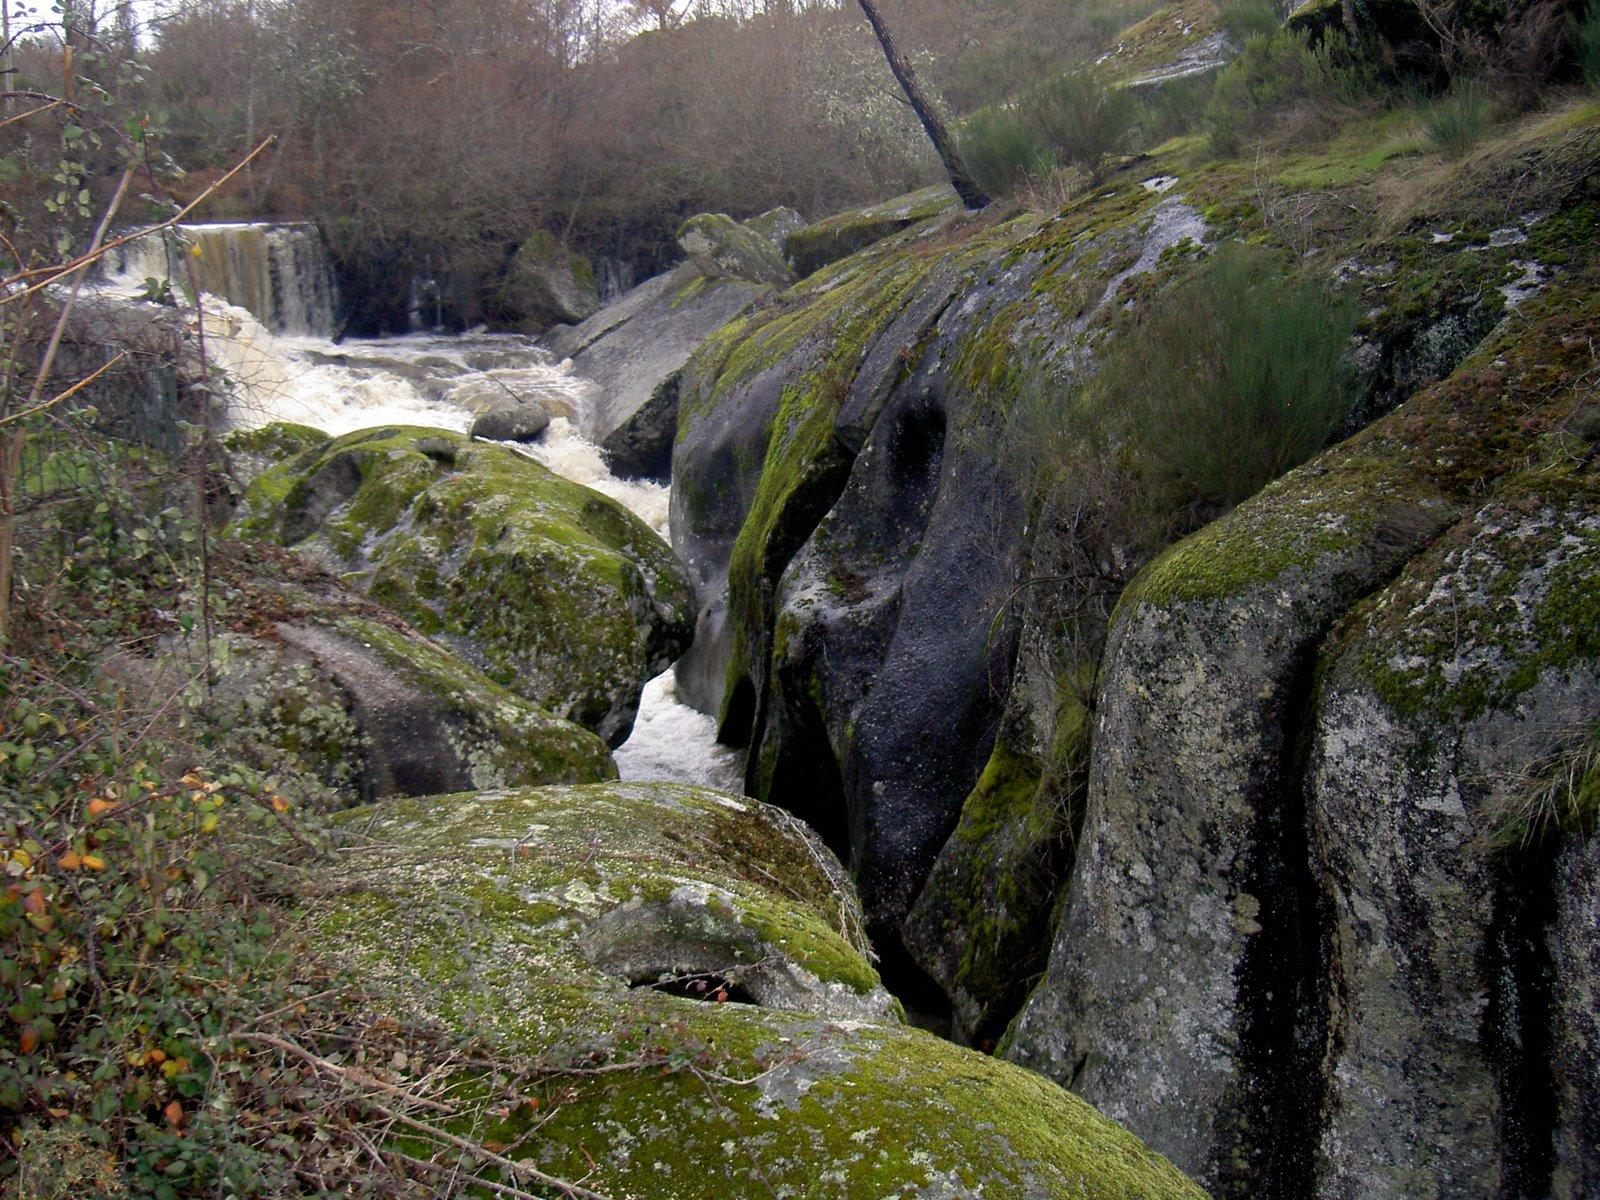 O Rio atravessa os rochedos